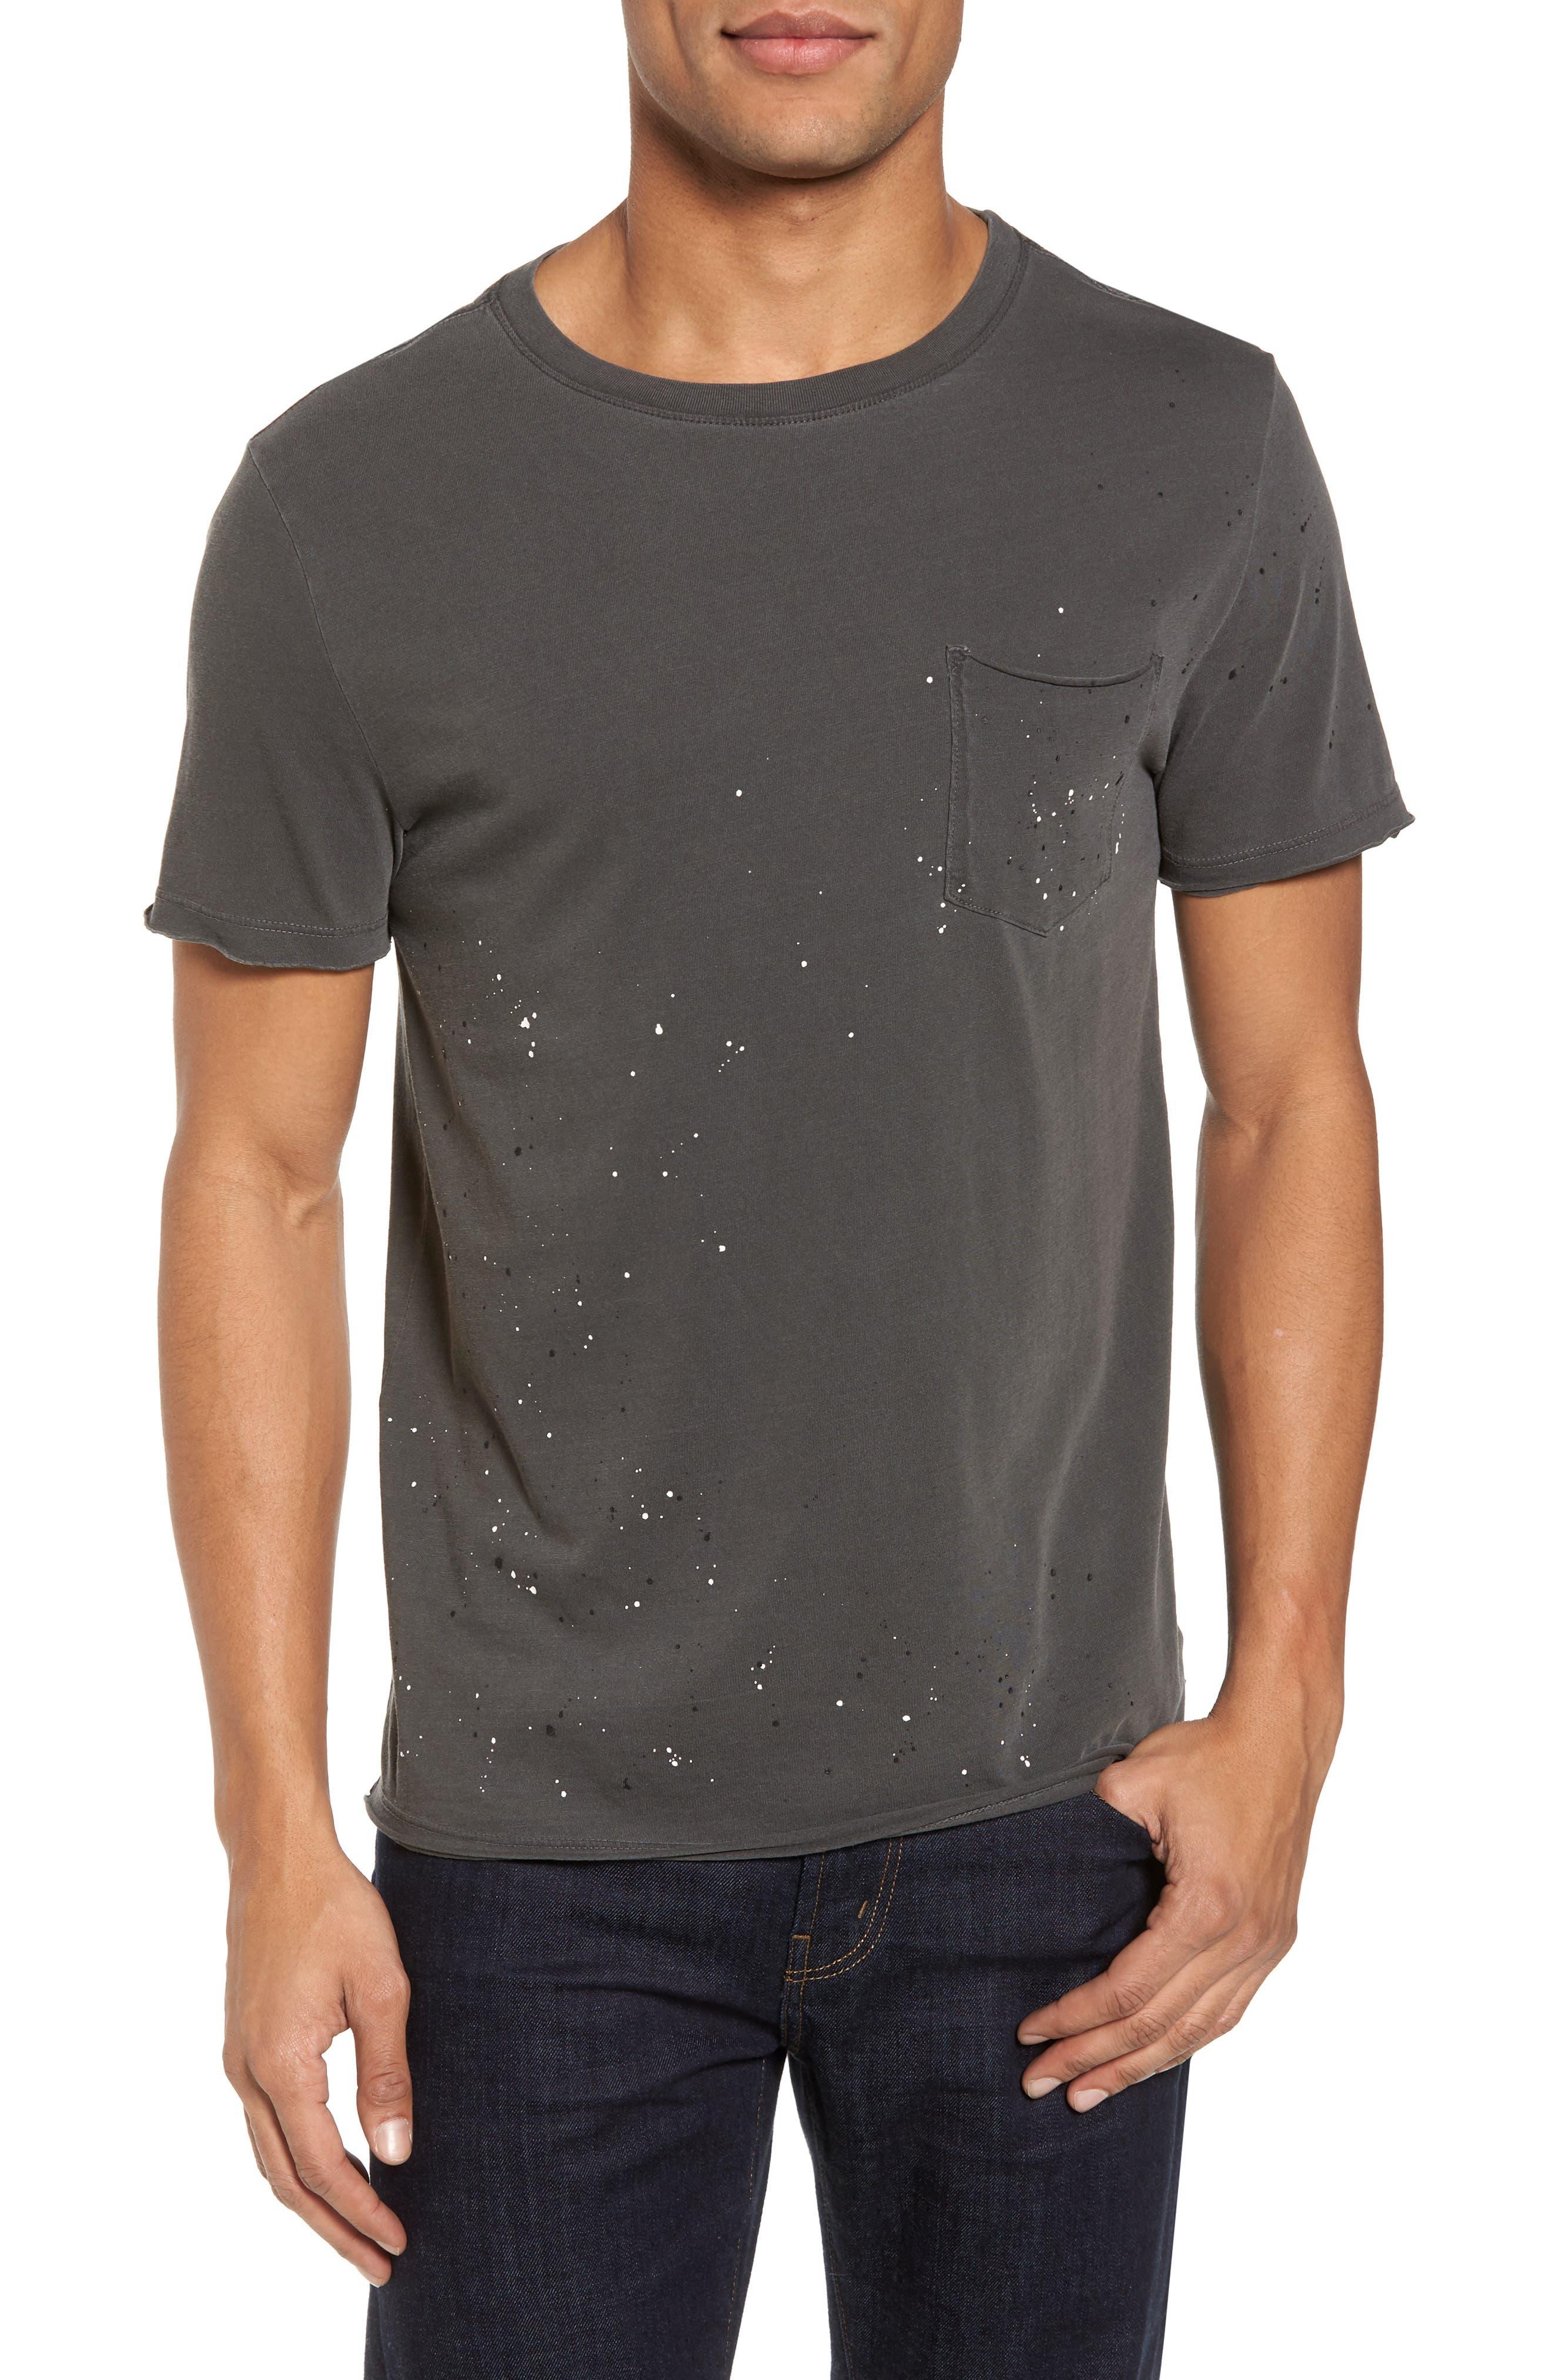 Anders Slim Fit Pocket T-Shirt,                             Main thumbnail 1, color,                             Multi Splatter Pigment Black